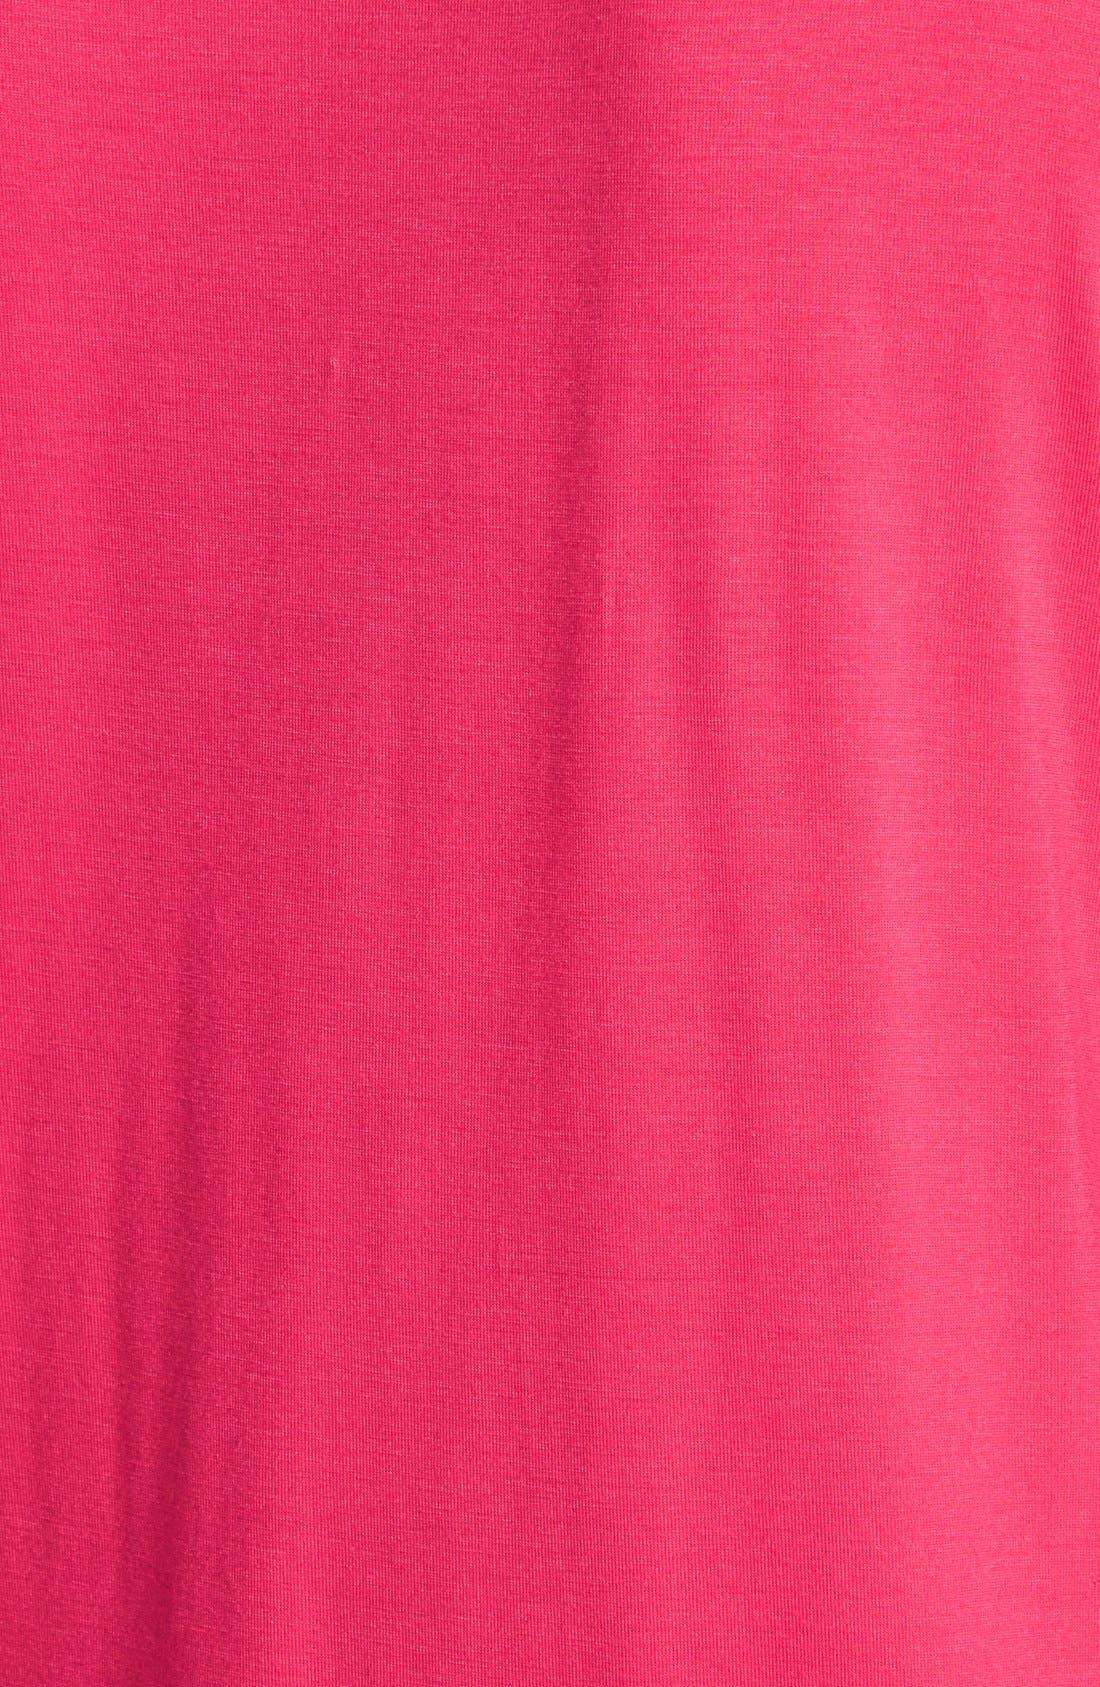 Mixed Media Tunic,                             Alternate thumbnail 3, color,                             Pink Polish